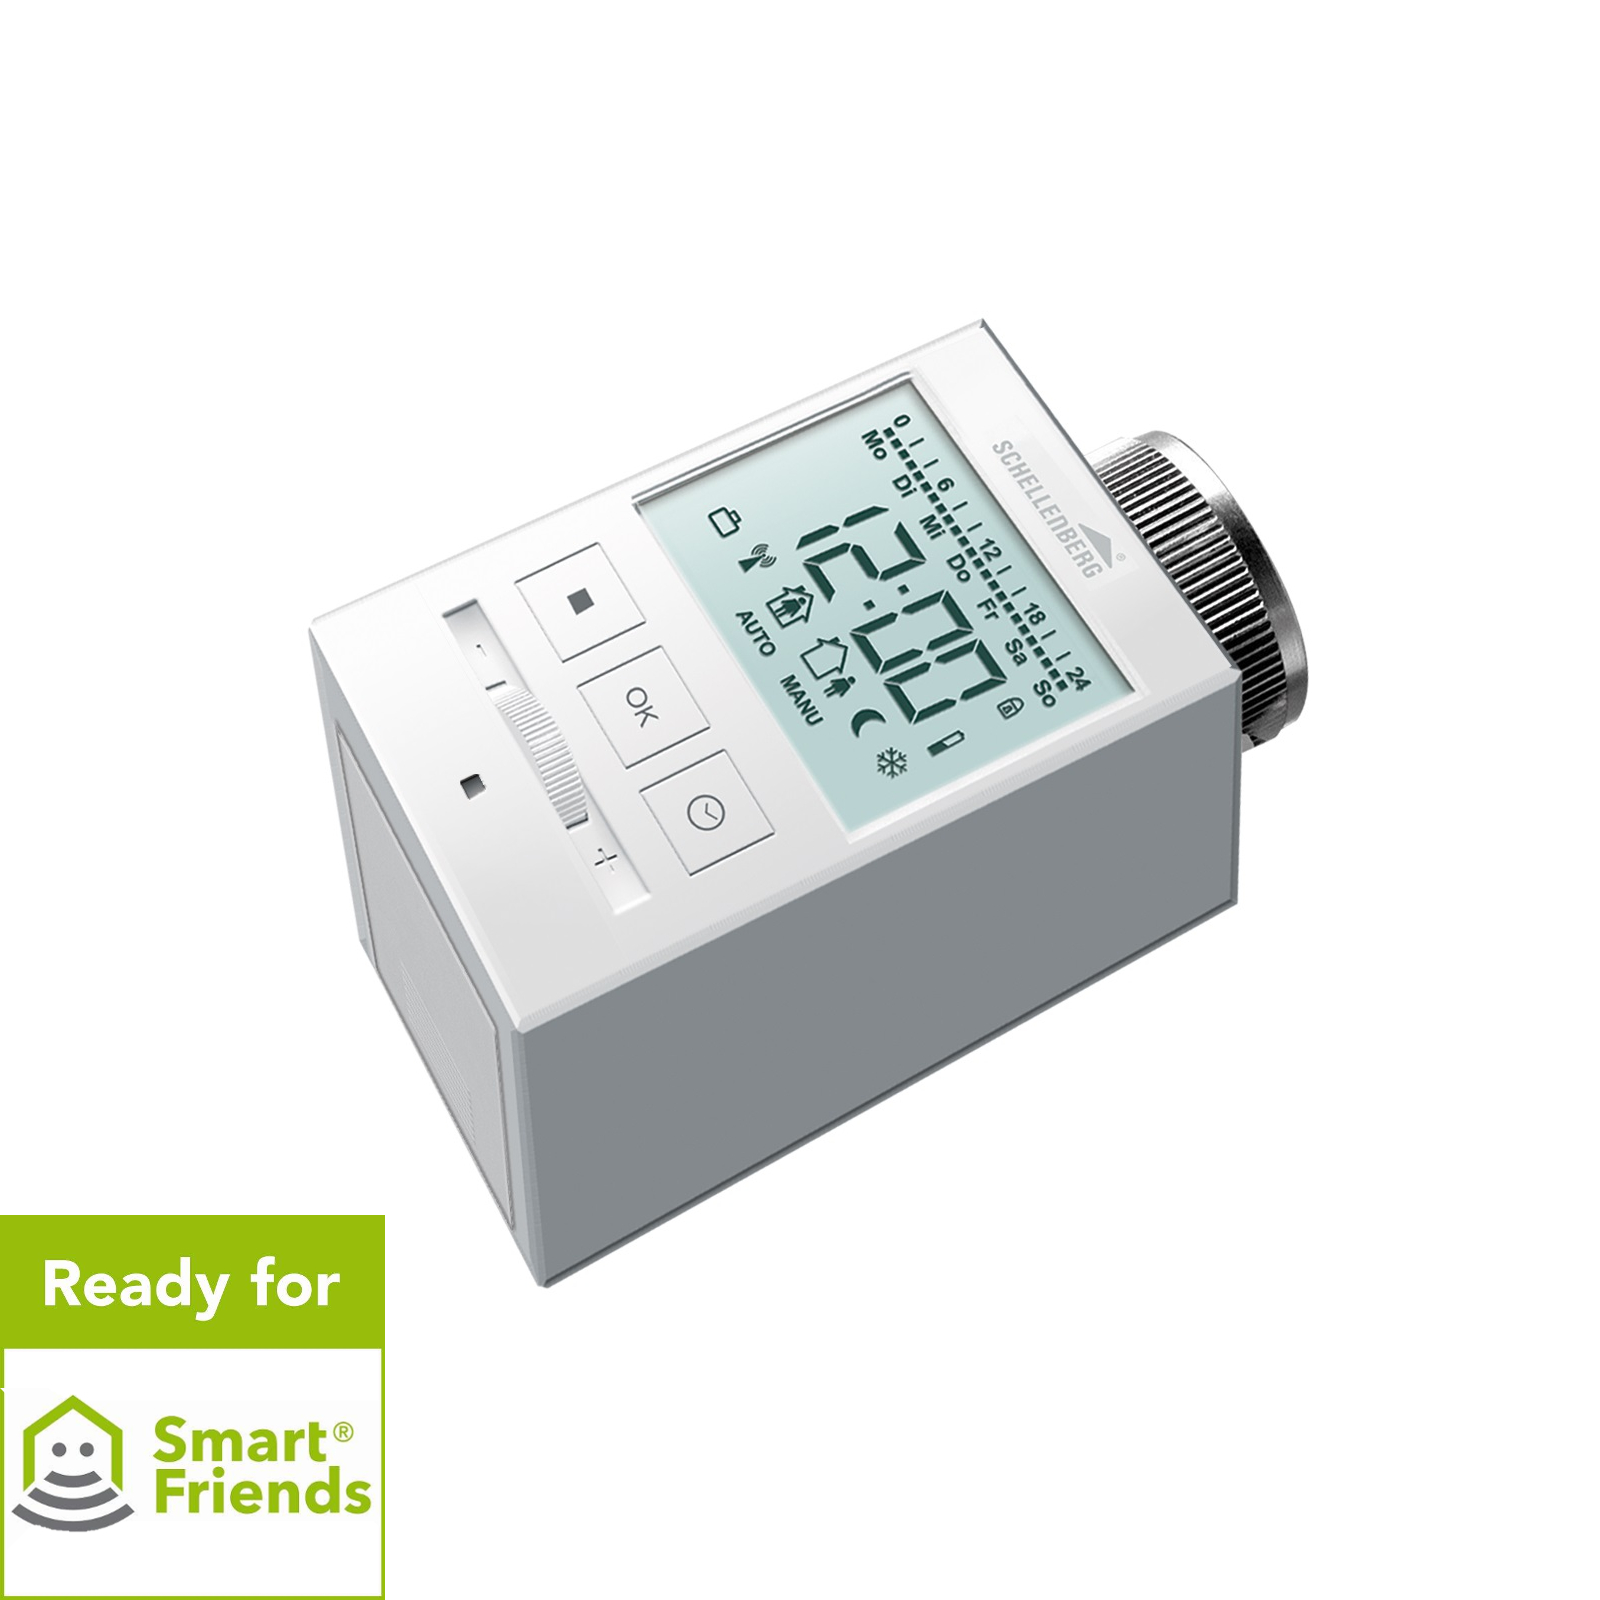 schellenberg funk heizk rperthermostat wei funk thermostat neu ebay. Black Bedroom Furniture Sets. Home Design Ideas